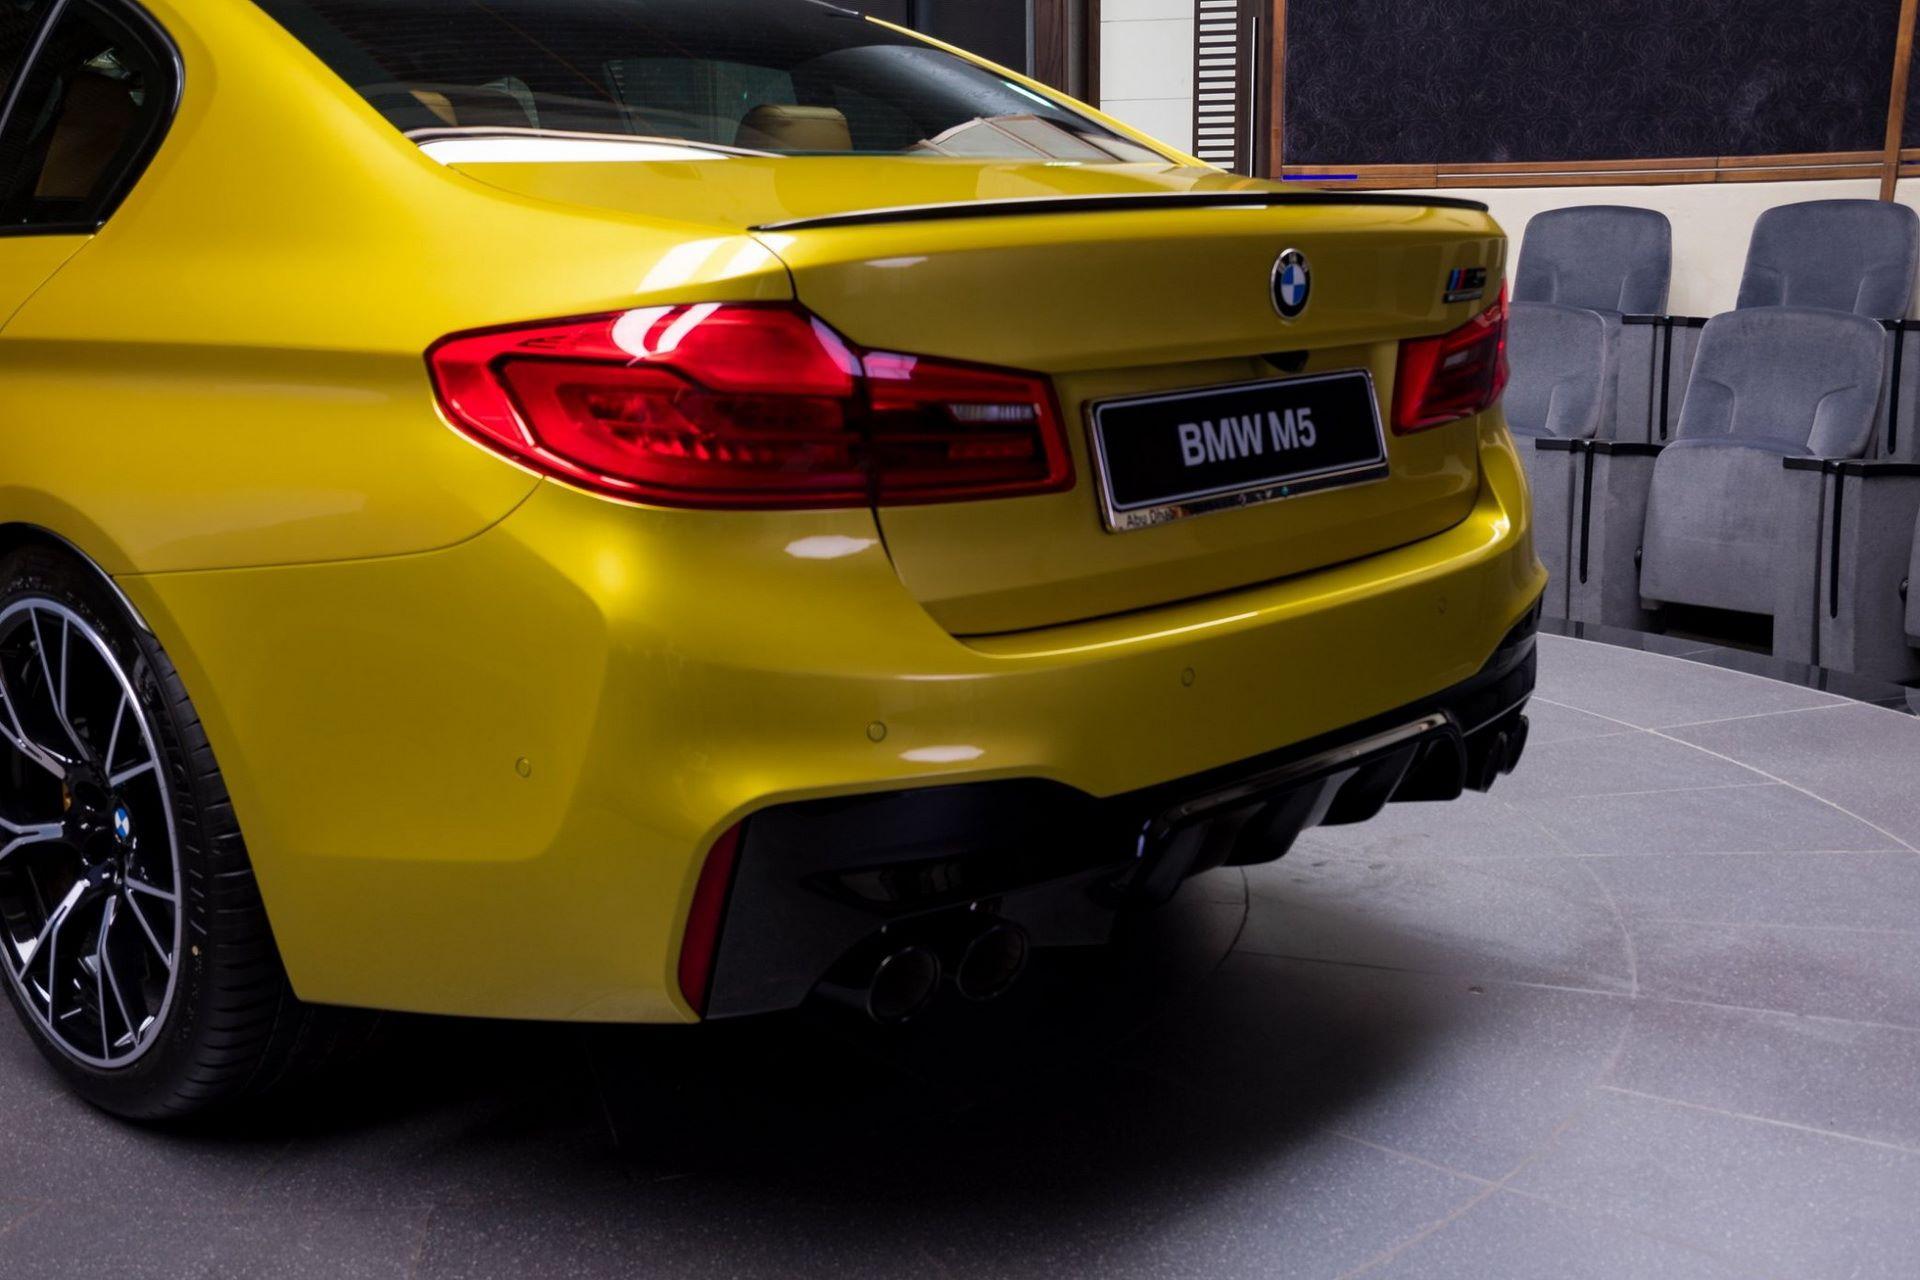 BMW-M5-Competition-Austin-Yellow-Abu-Dhabi-Motors-34